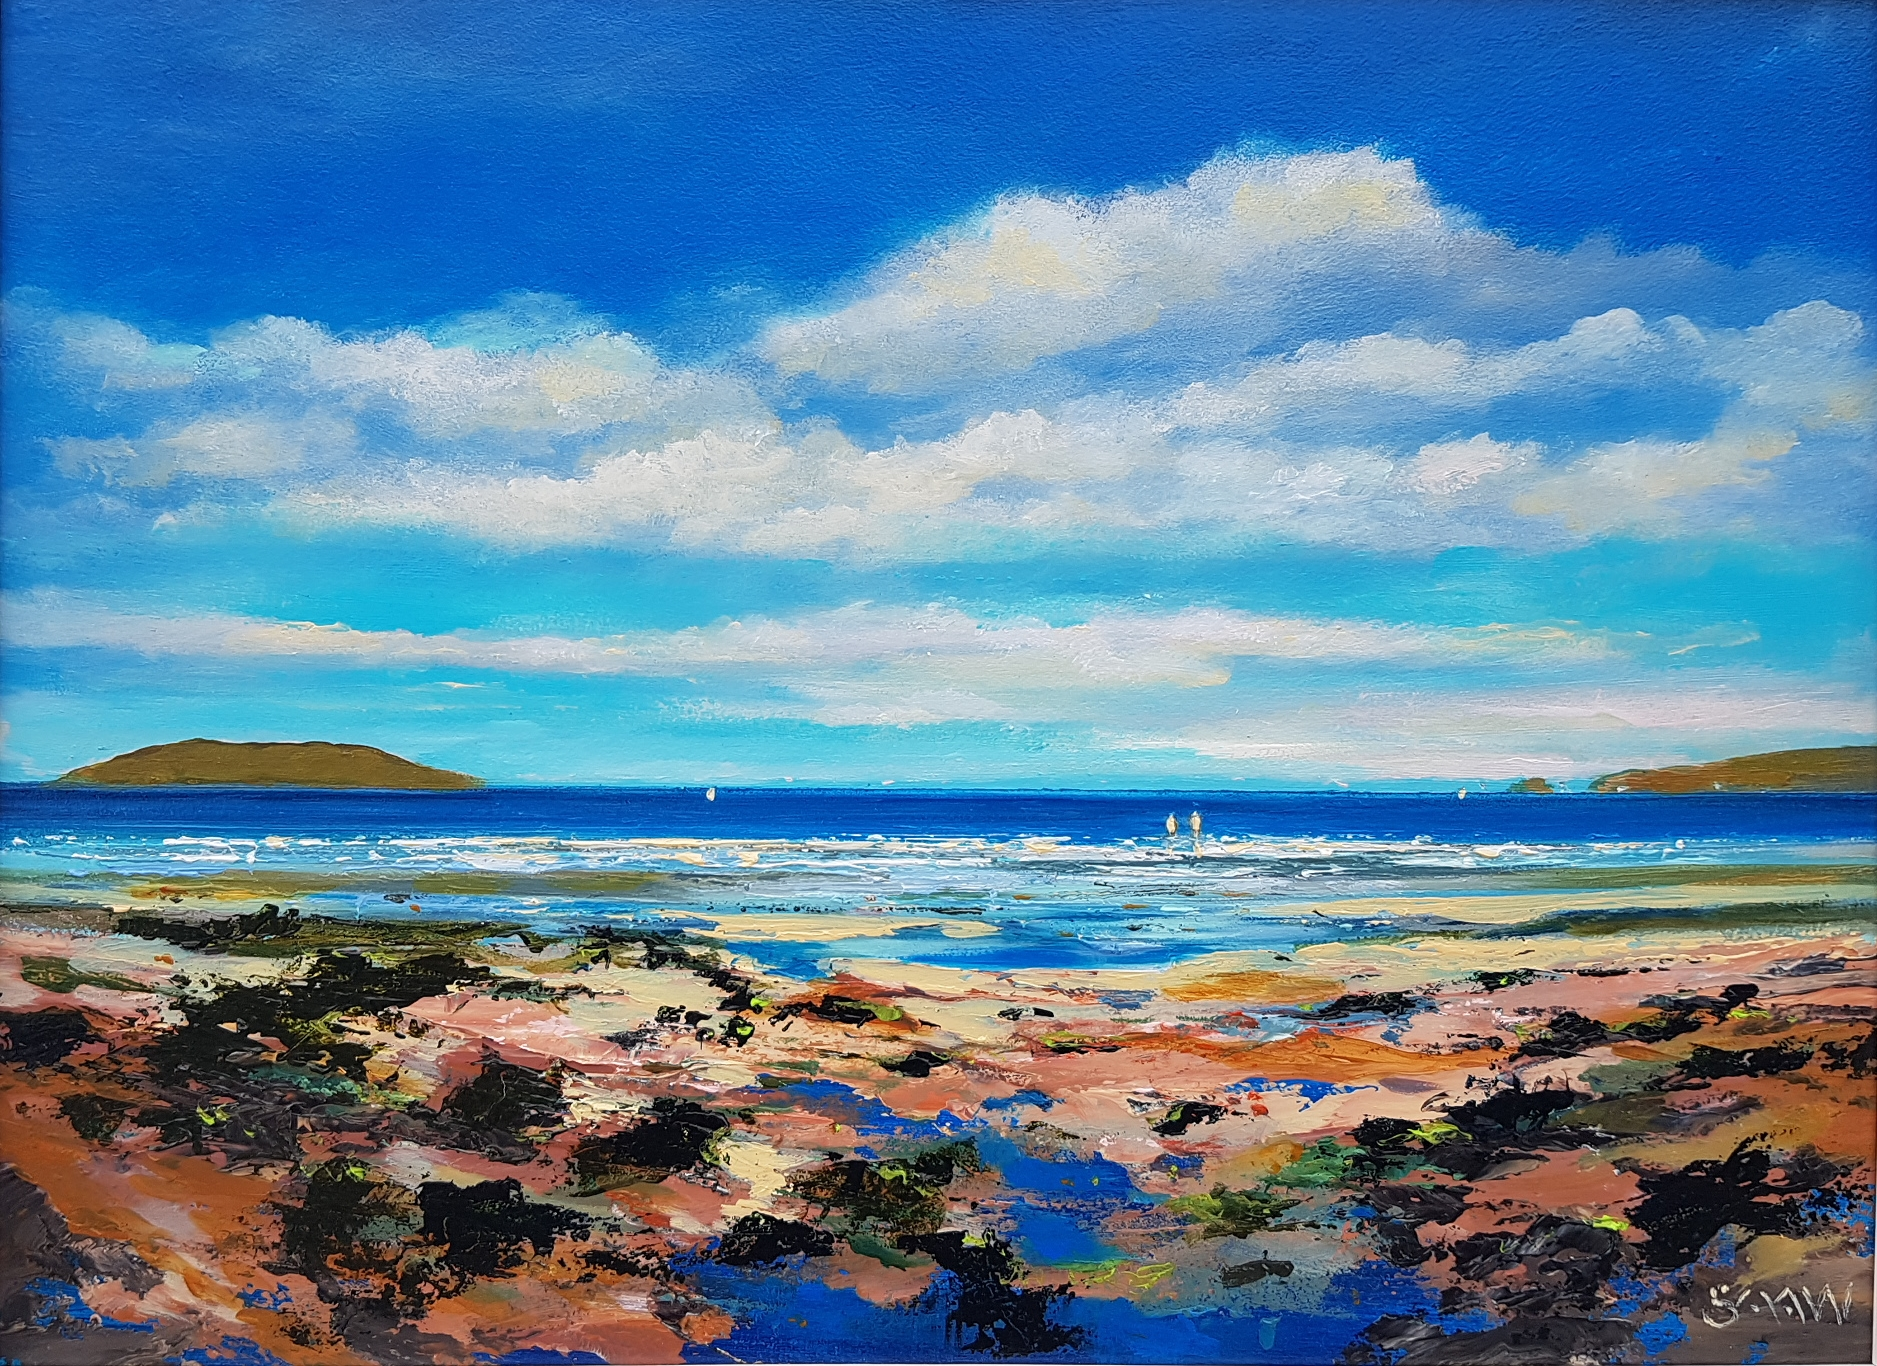 Portmarnock Blue - Robert Shaw